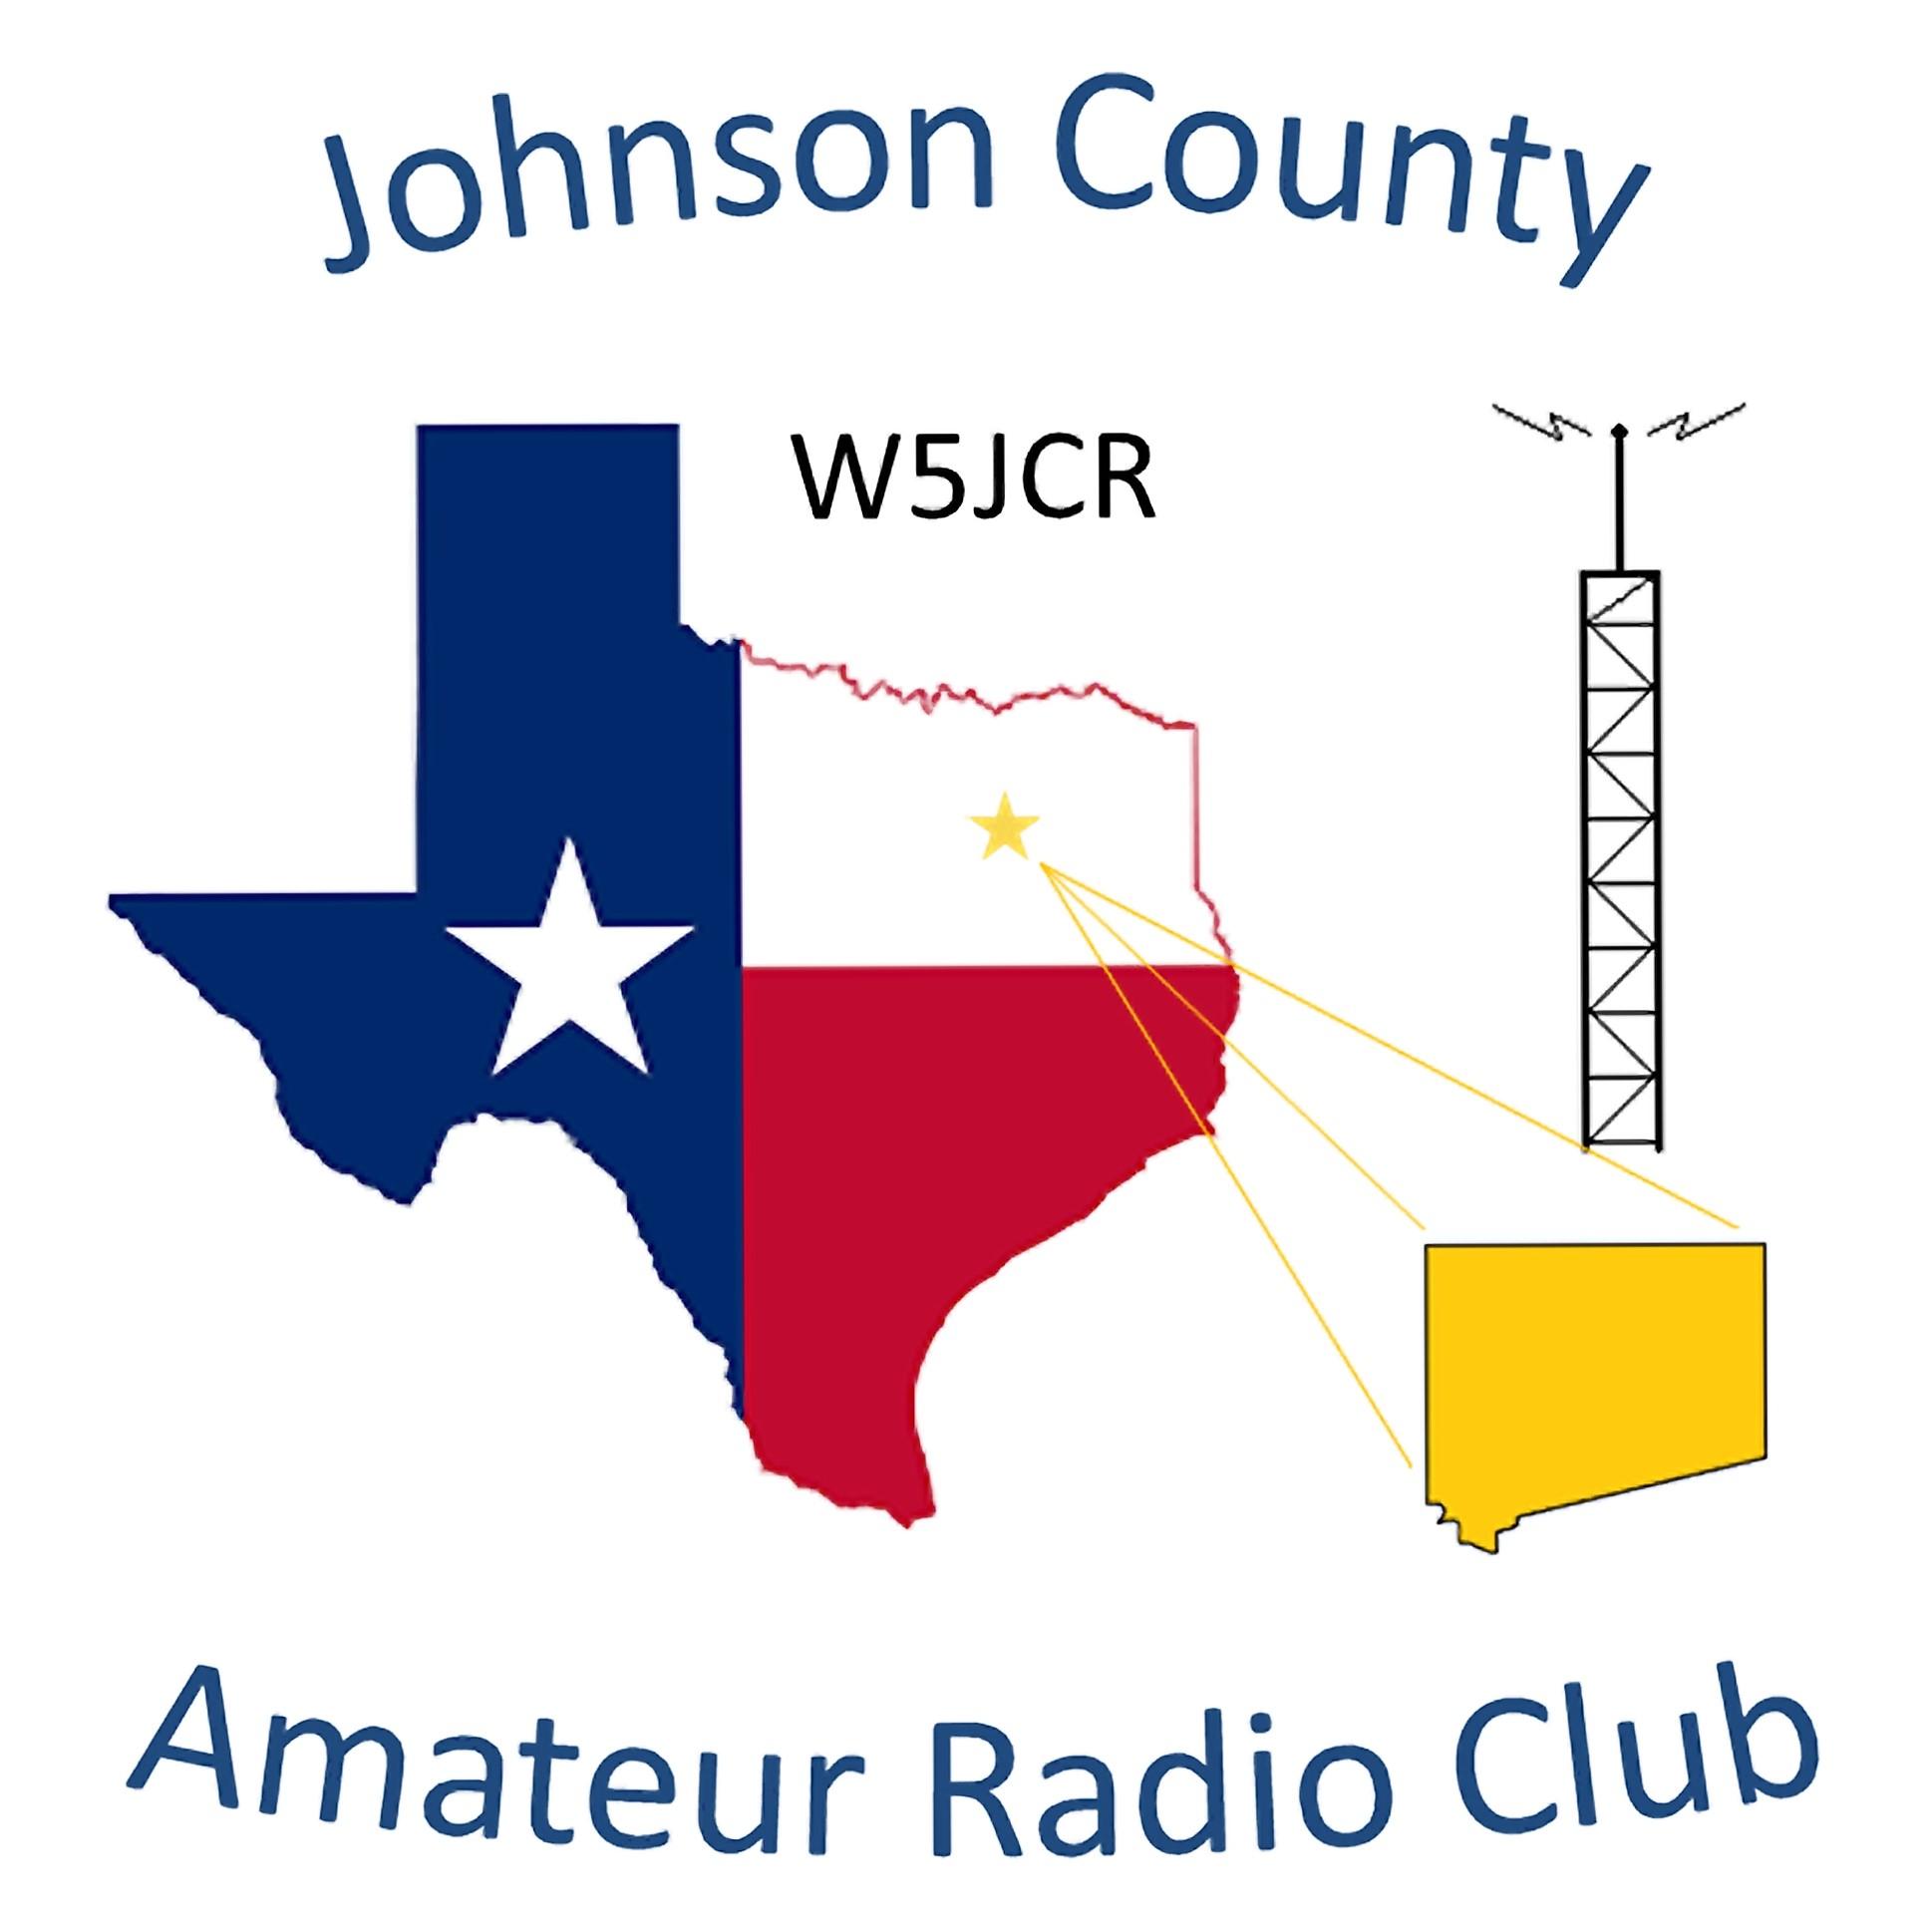 Johnson County Amateur Radio Club